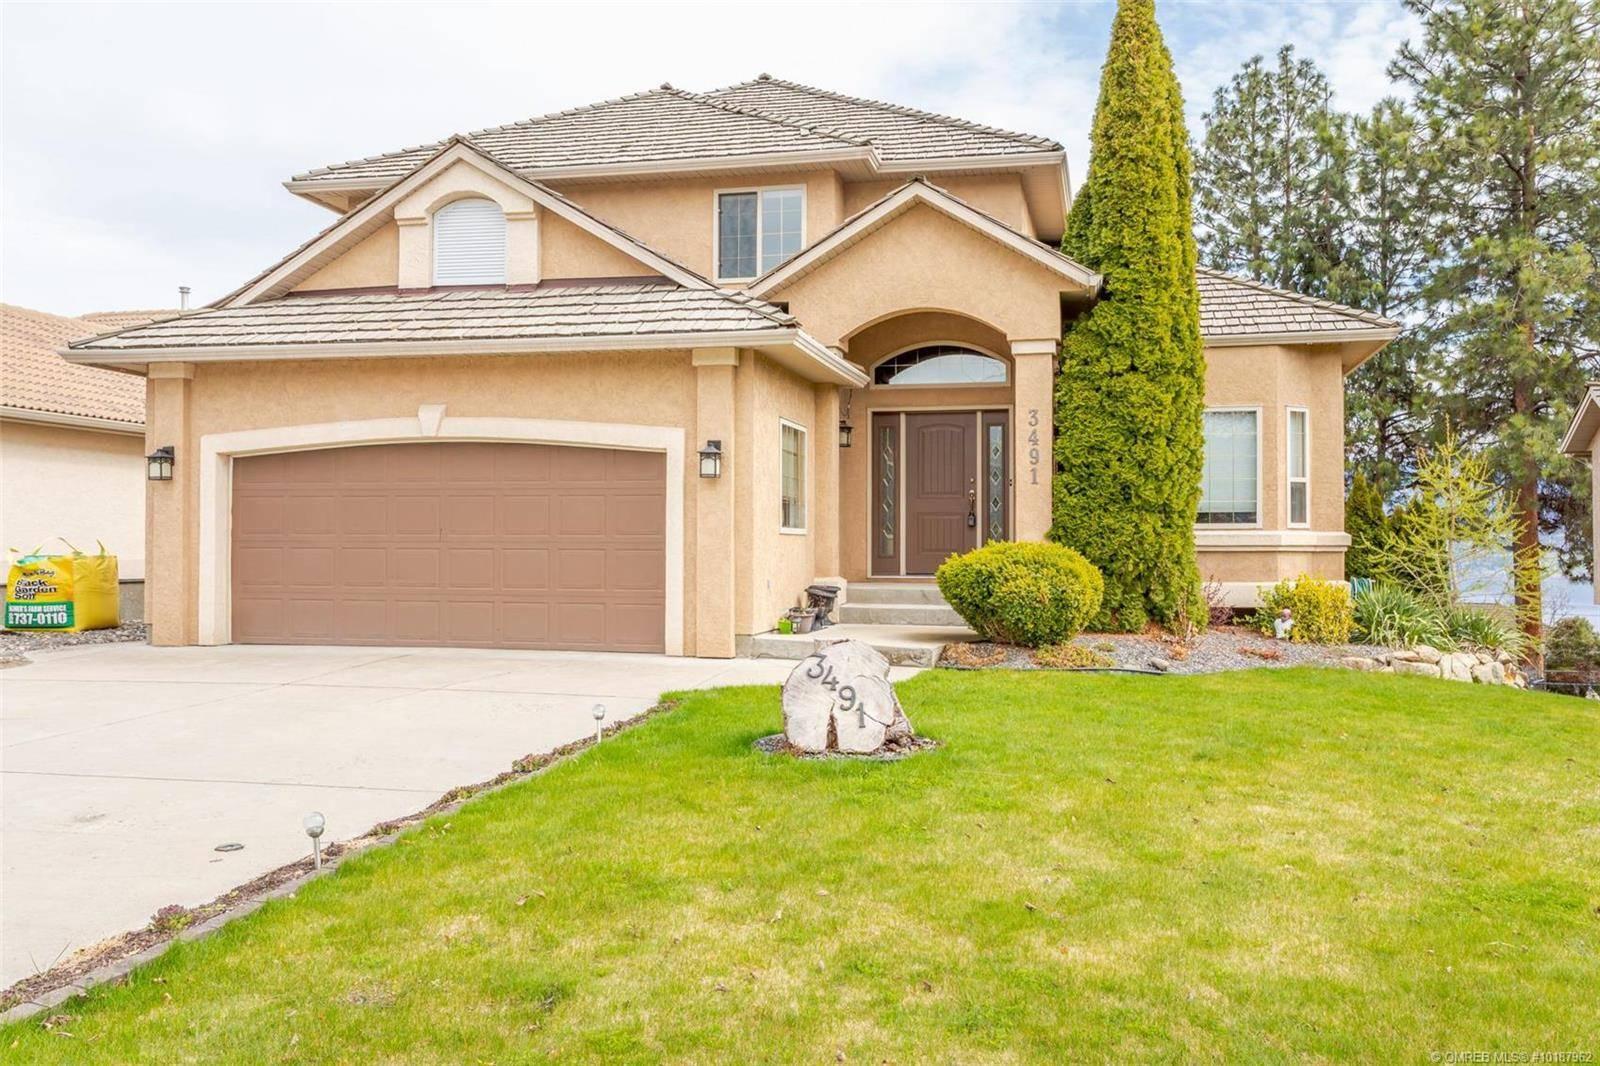 House for sale at 3491 Ridge Blvd West Kelowna British Columbia - MLS: 10187962